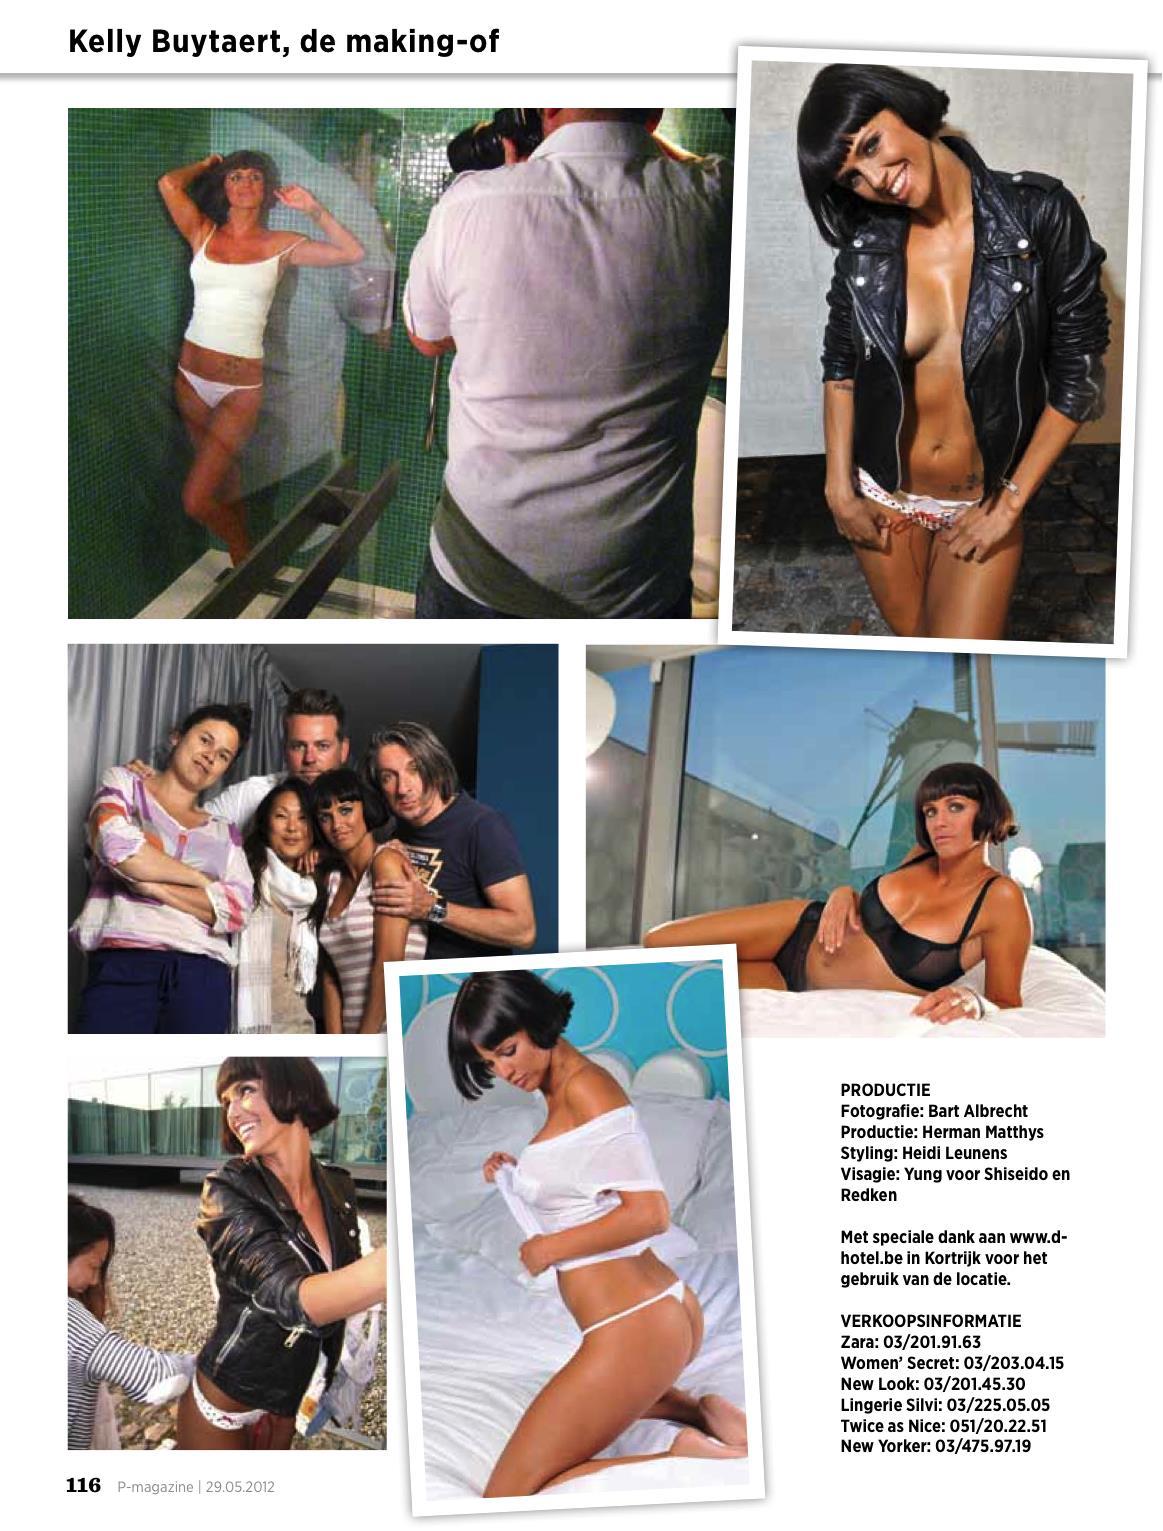 bart albrecht fotograaf photographer belgium p magazine che playboy editorial magazines glamour boudoir daniela degraux kelly buytaert 0010.jpg